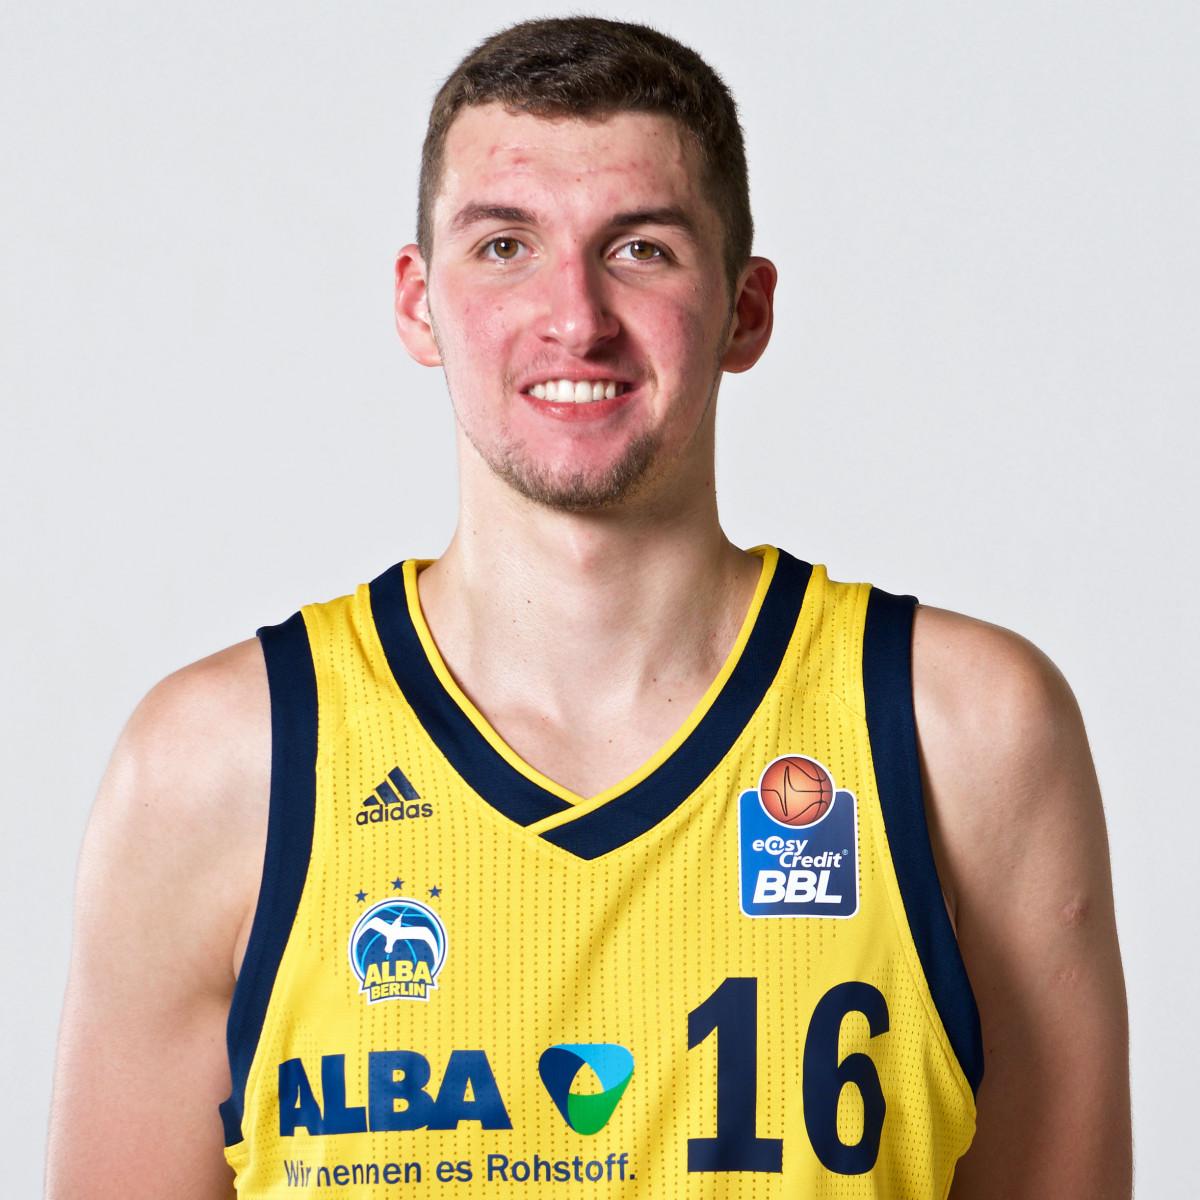 Photo of Kresimir Nikic, 2018-2019 season